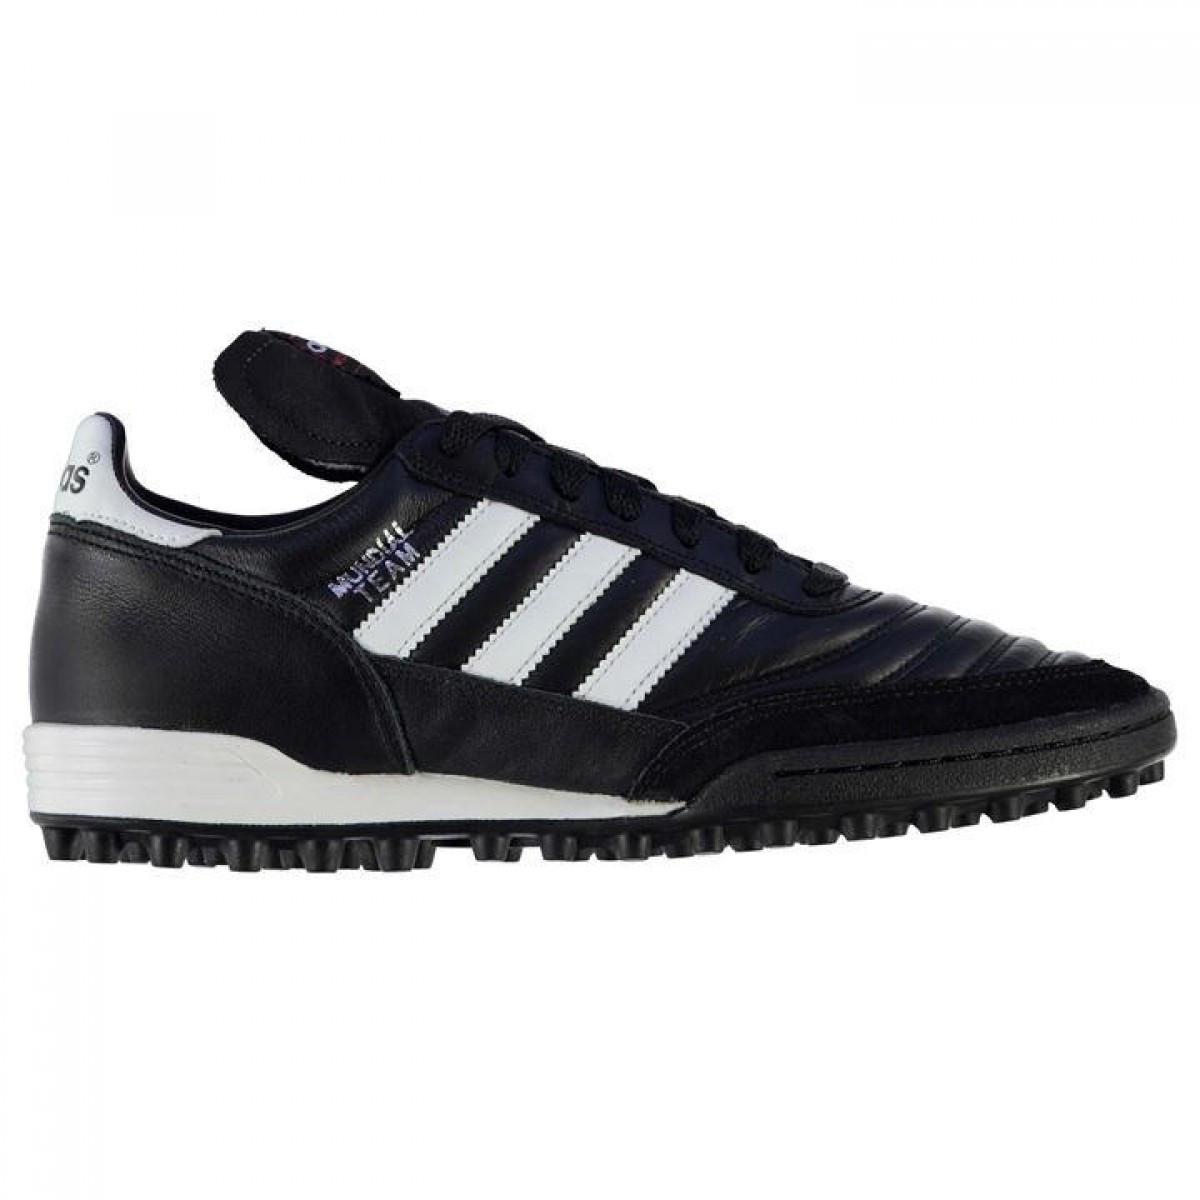 Бутсы Adidas Mundial Team Astro Turf Black White - Оригинал — в ... 5037811bab5e2